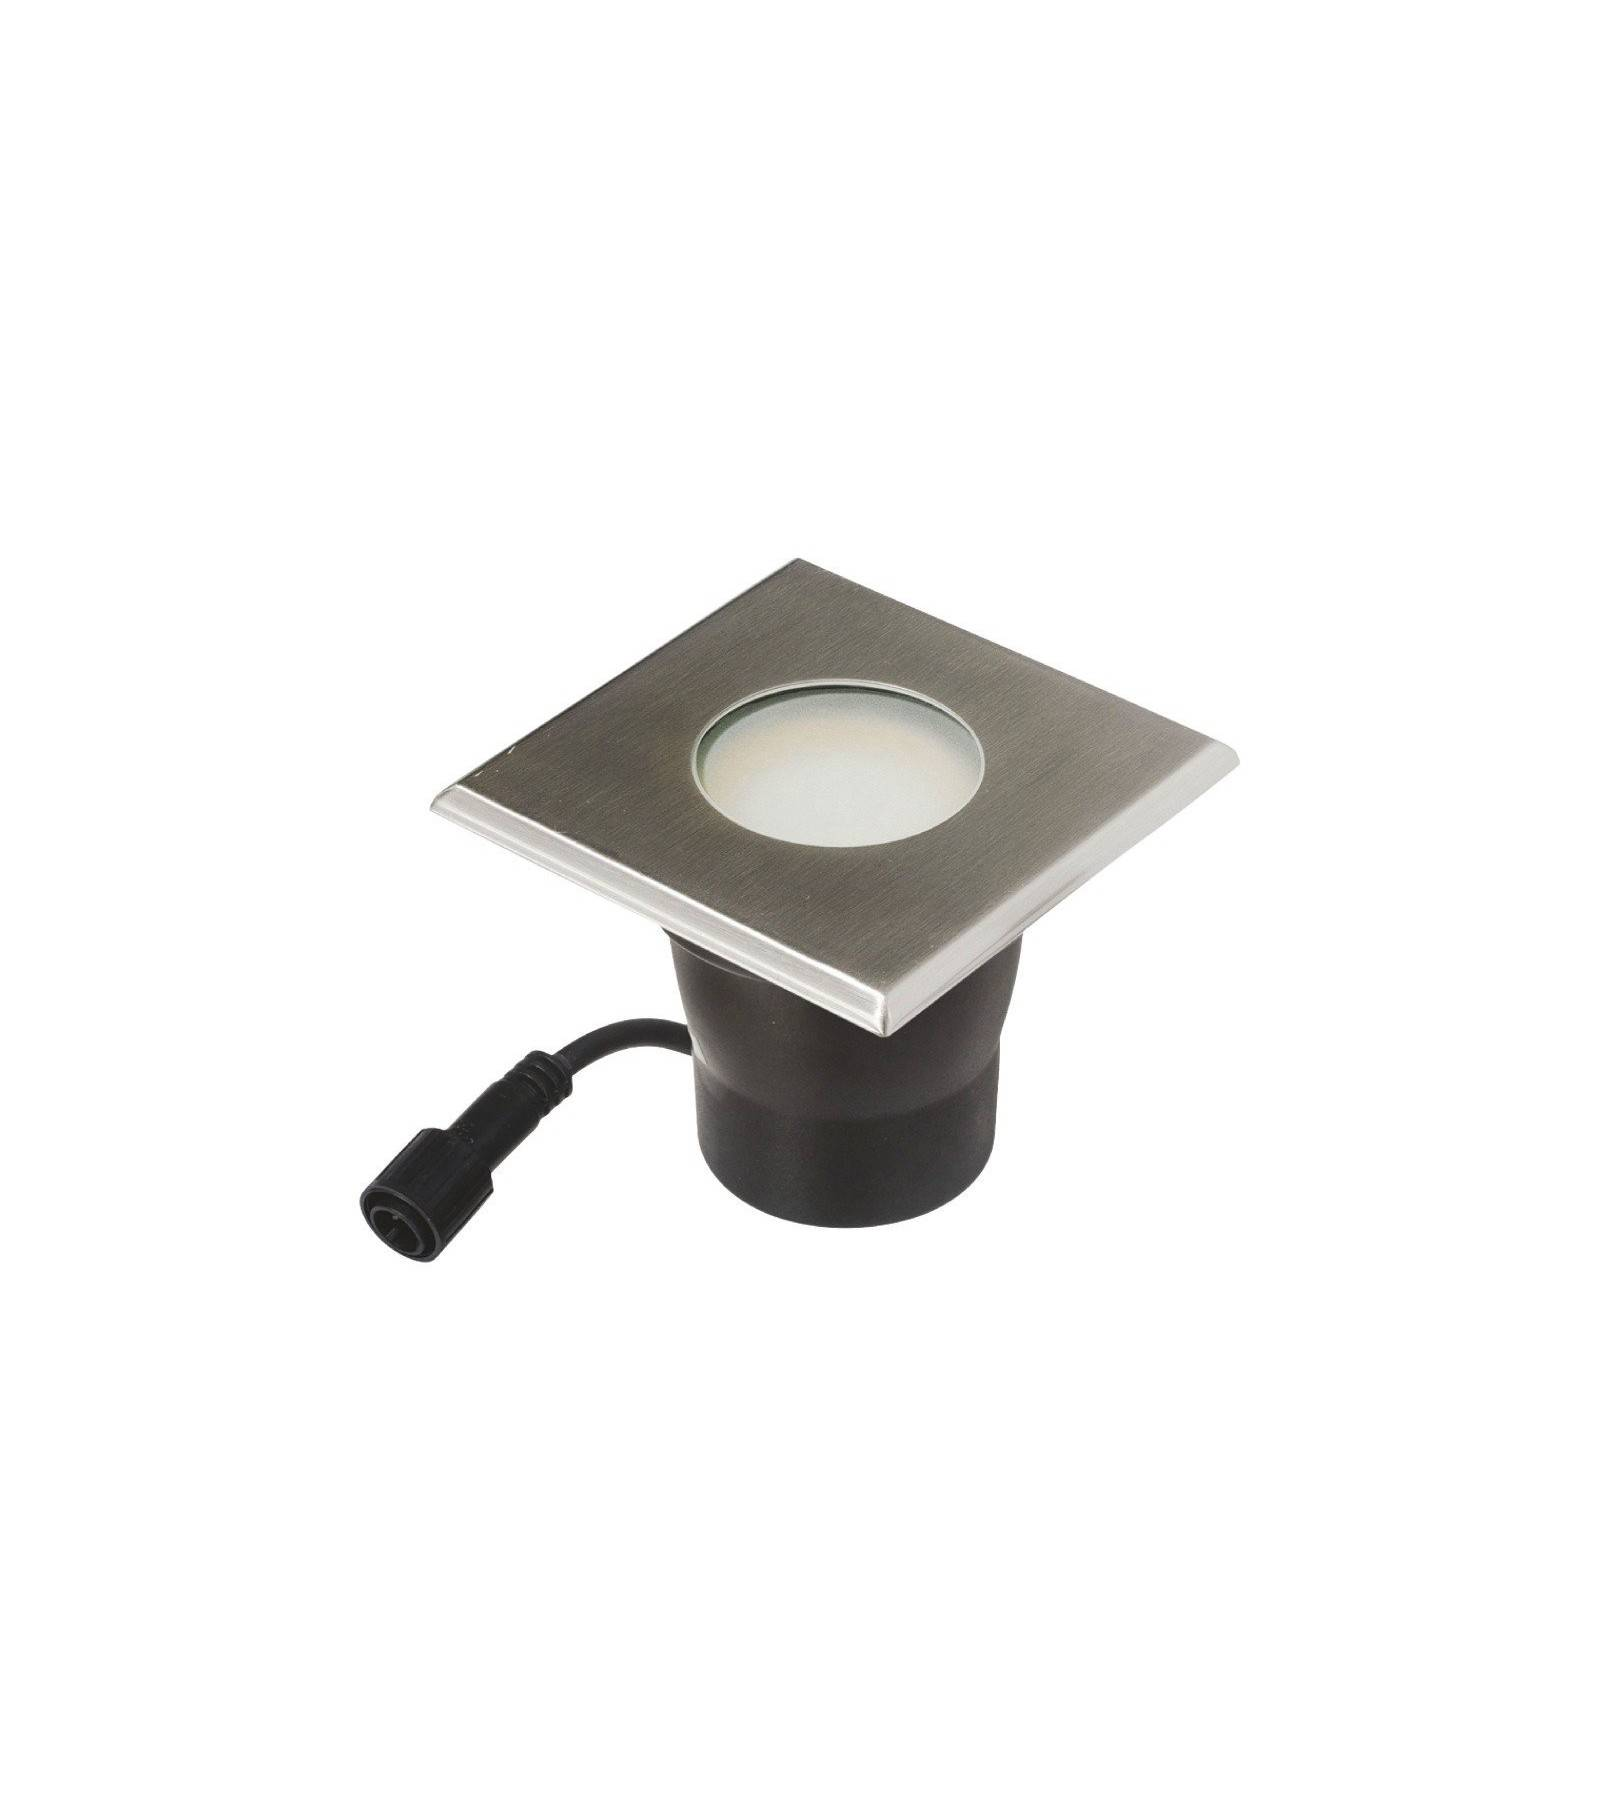 spot encastrable carr 16cm special terrase beton groundlight gu10 mr30 fournie ip67 blanc chaud. Black Bedroom Furniture Sets. Home Design Ideas